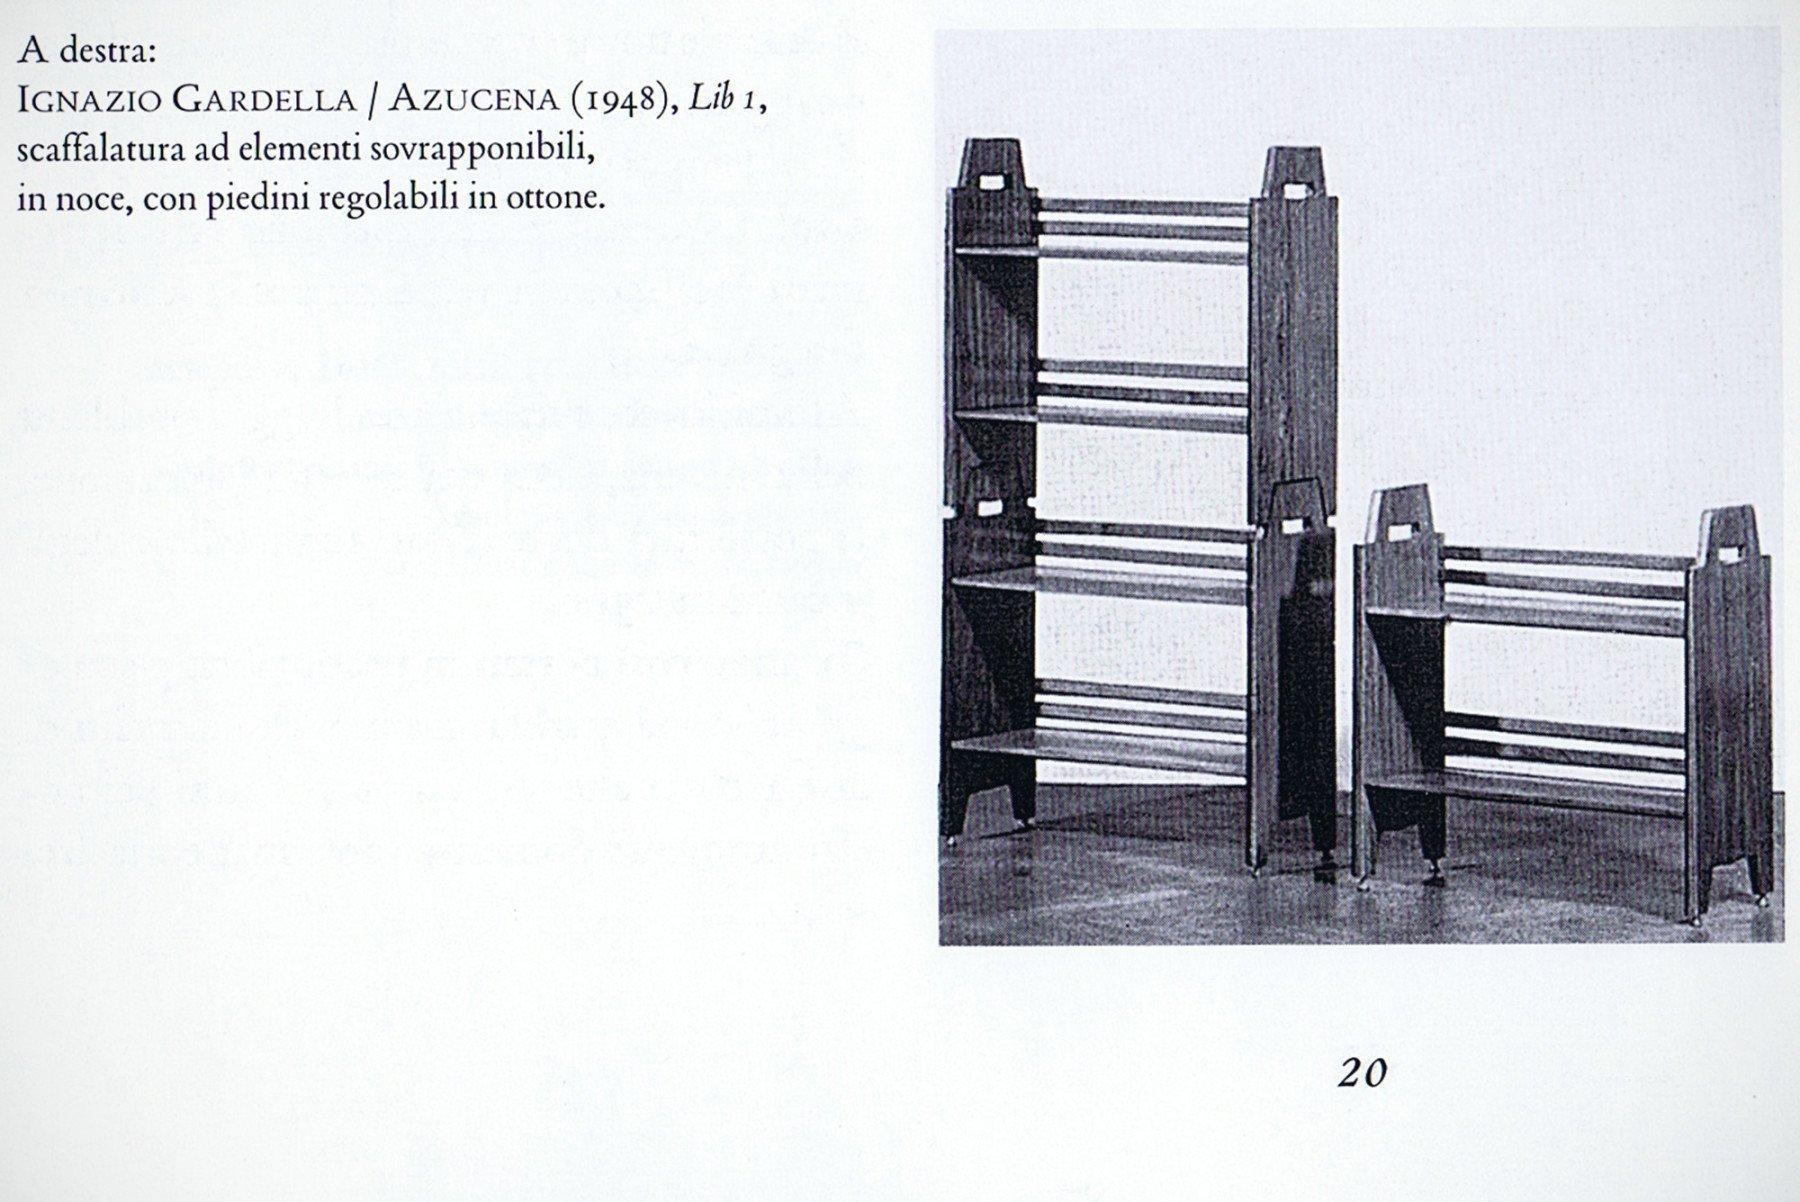 Ignazio Gardella |  Shelving unit model lib 1